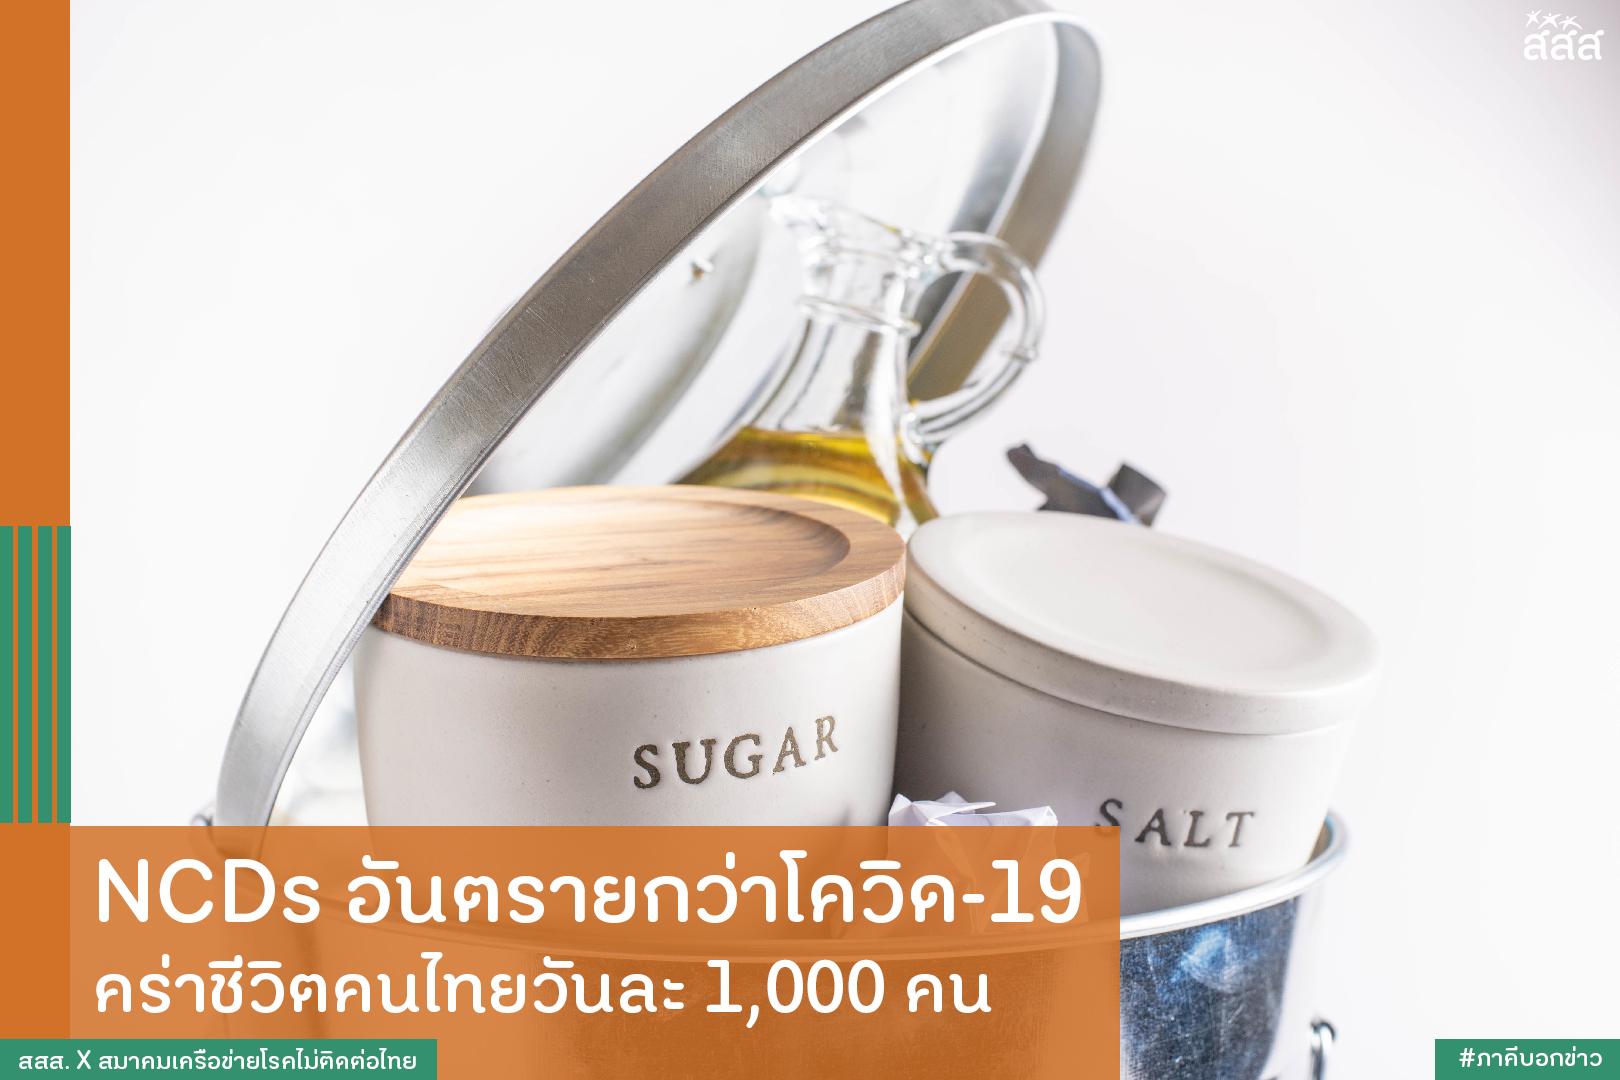 NCDs อันตรายกว่าโควิด-19 คร่าชีวิตคนไทยวันละ 1,000 คน thaihealth